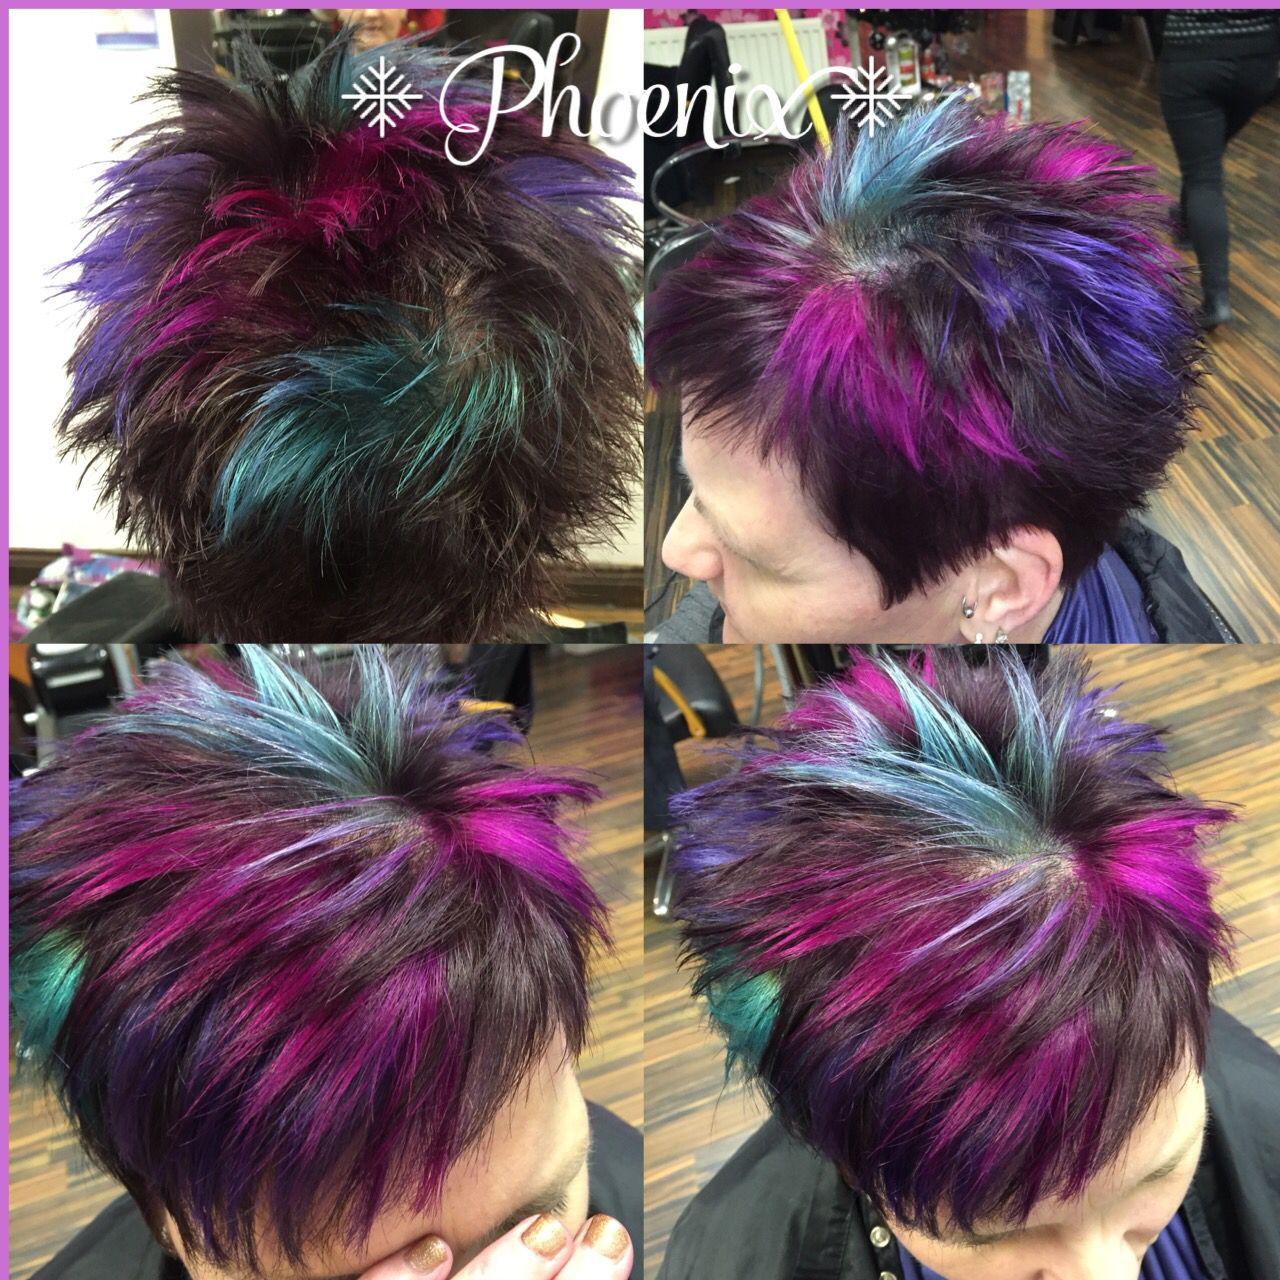 Funky Short Hair Crazy Colour Purple Hair Blue Hair Pink Hair Turquoise Hair Colour County Durham Www Ph Turquoise Hair Hair Color Crazy Hair Inspiration Color